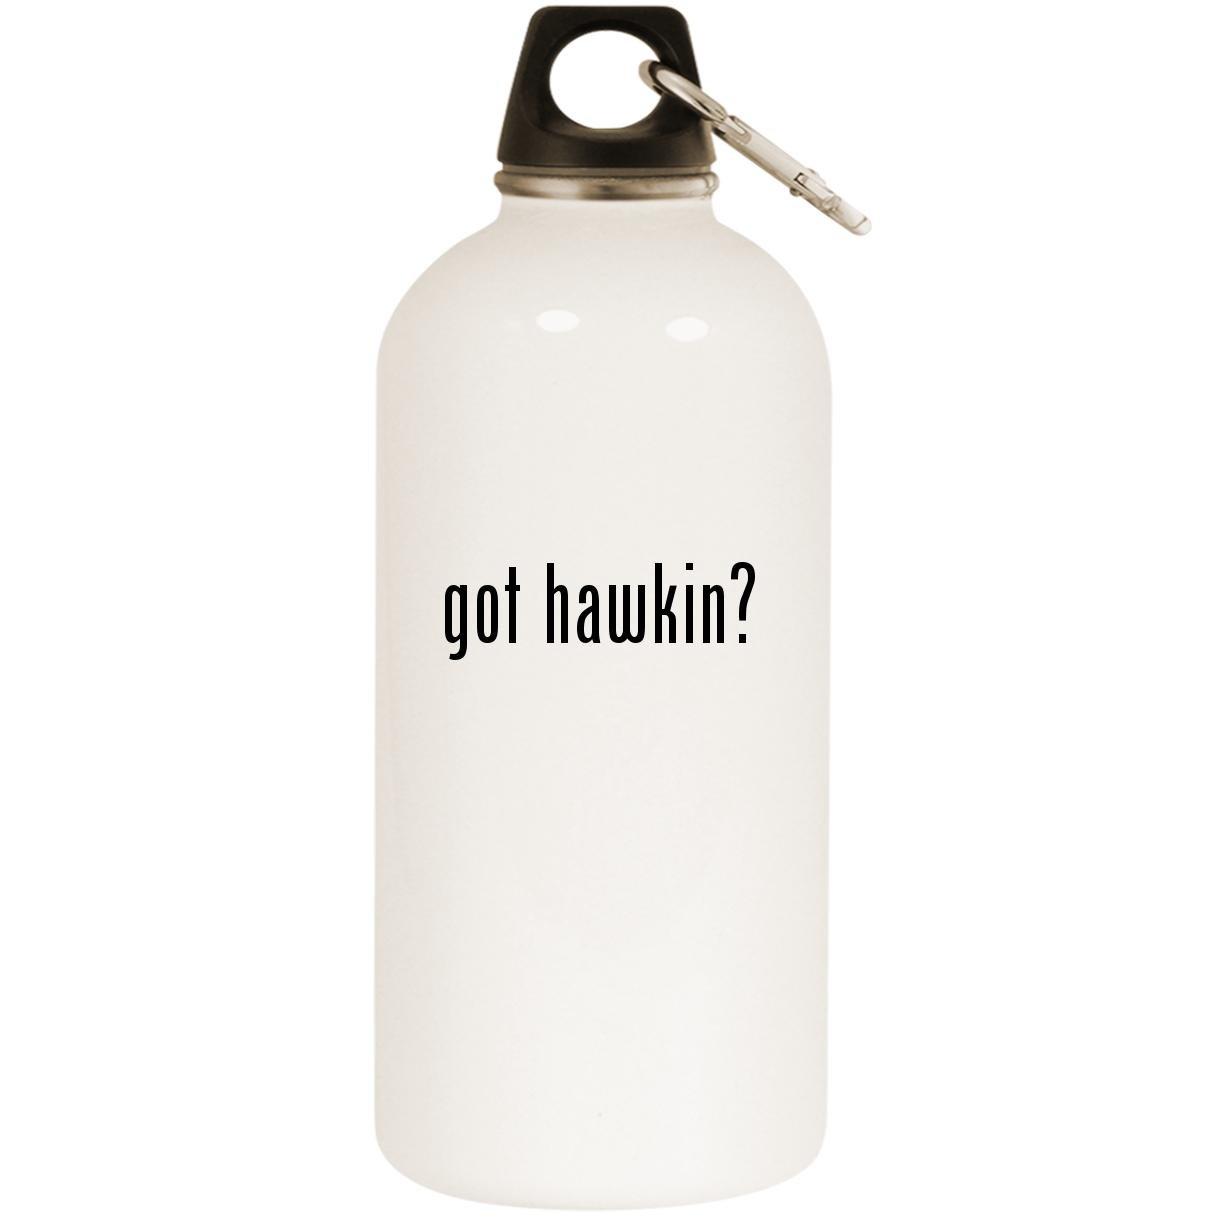 got hawkin? - White 20oz Stainless Steel Water Bottle with Carabiner